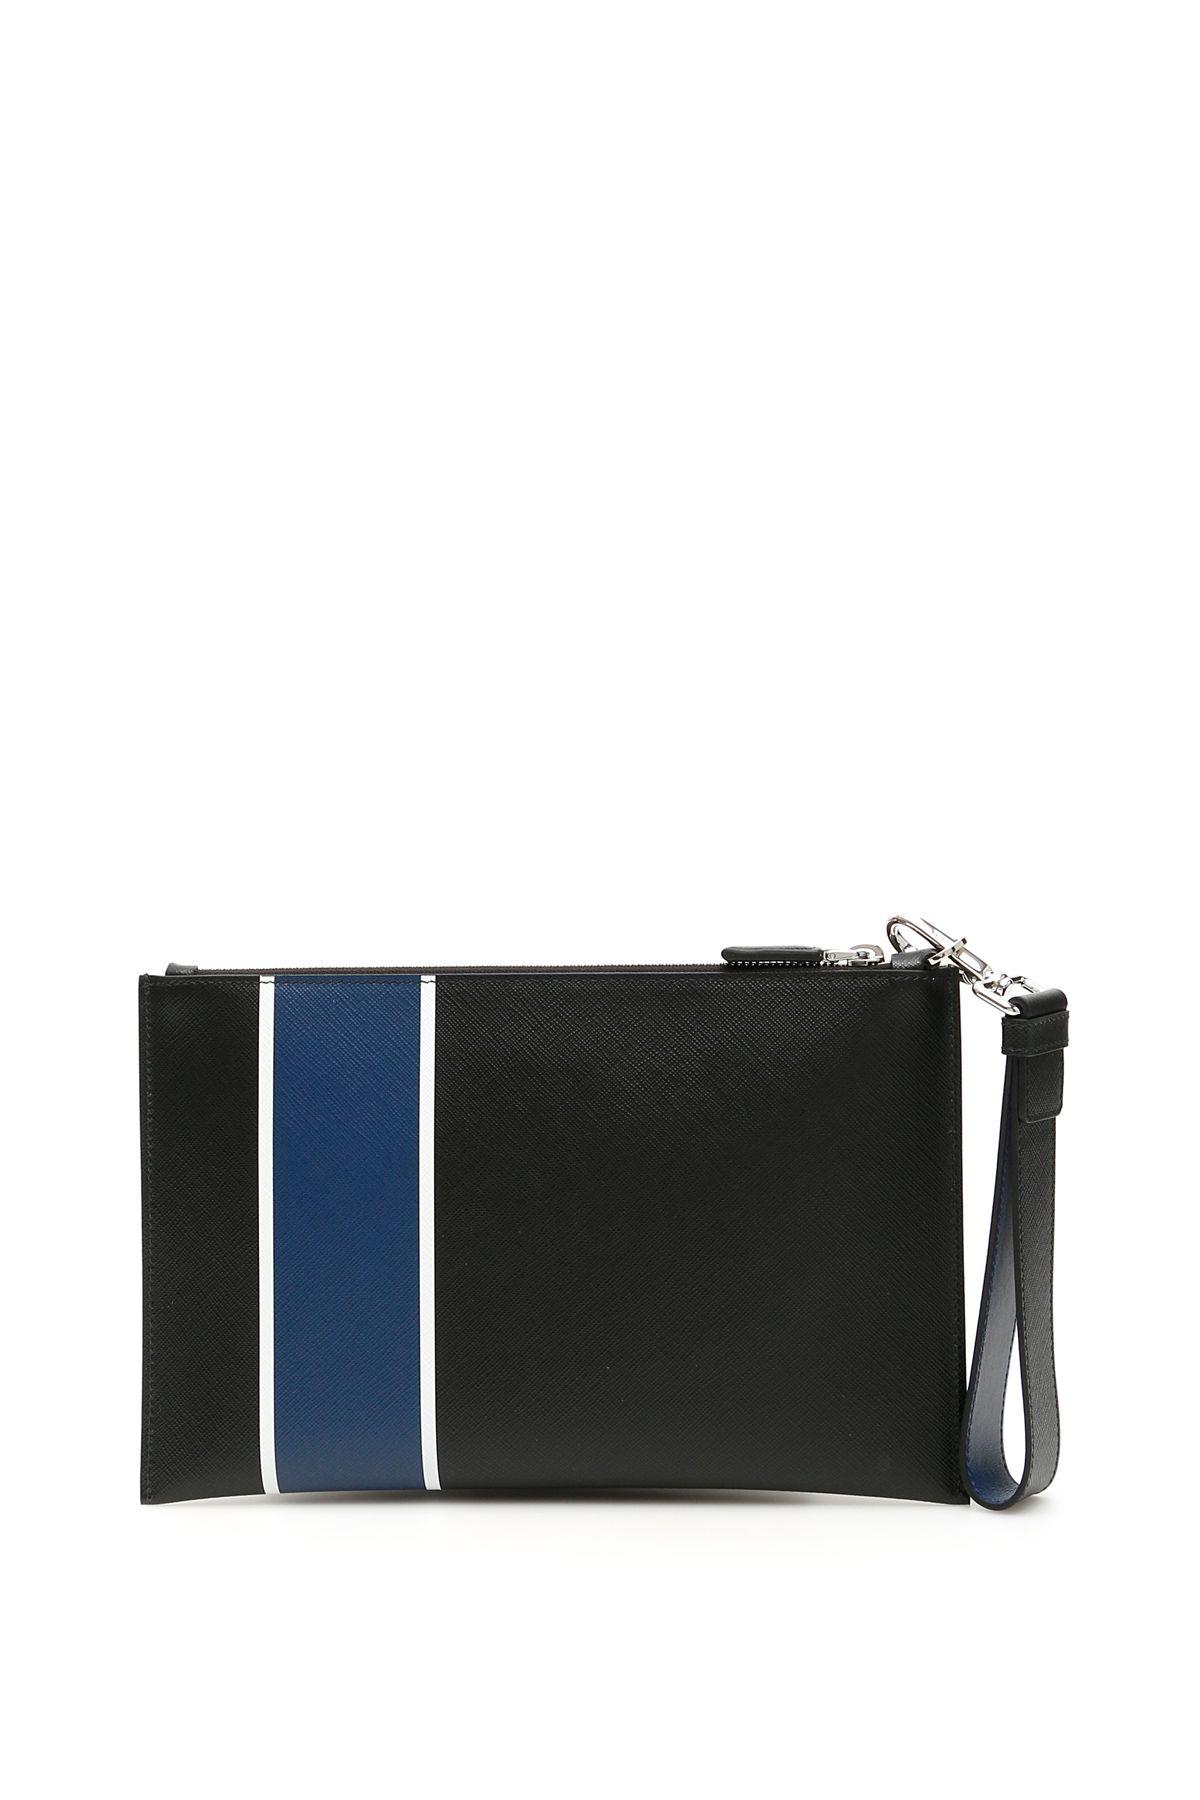 8ee548f6c6ff71 Prada Prada Saffiano Stripe Pouch - NERO BLUE (Black) - 10967840 ...